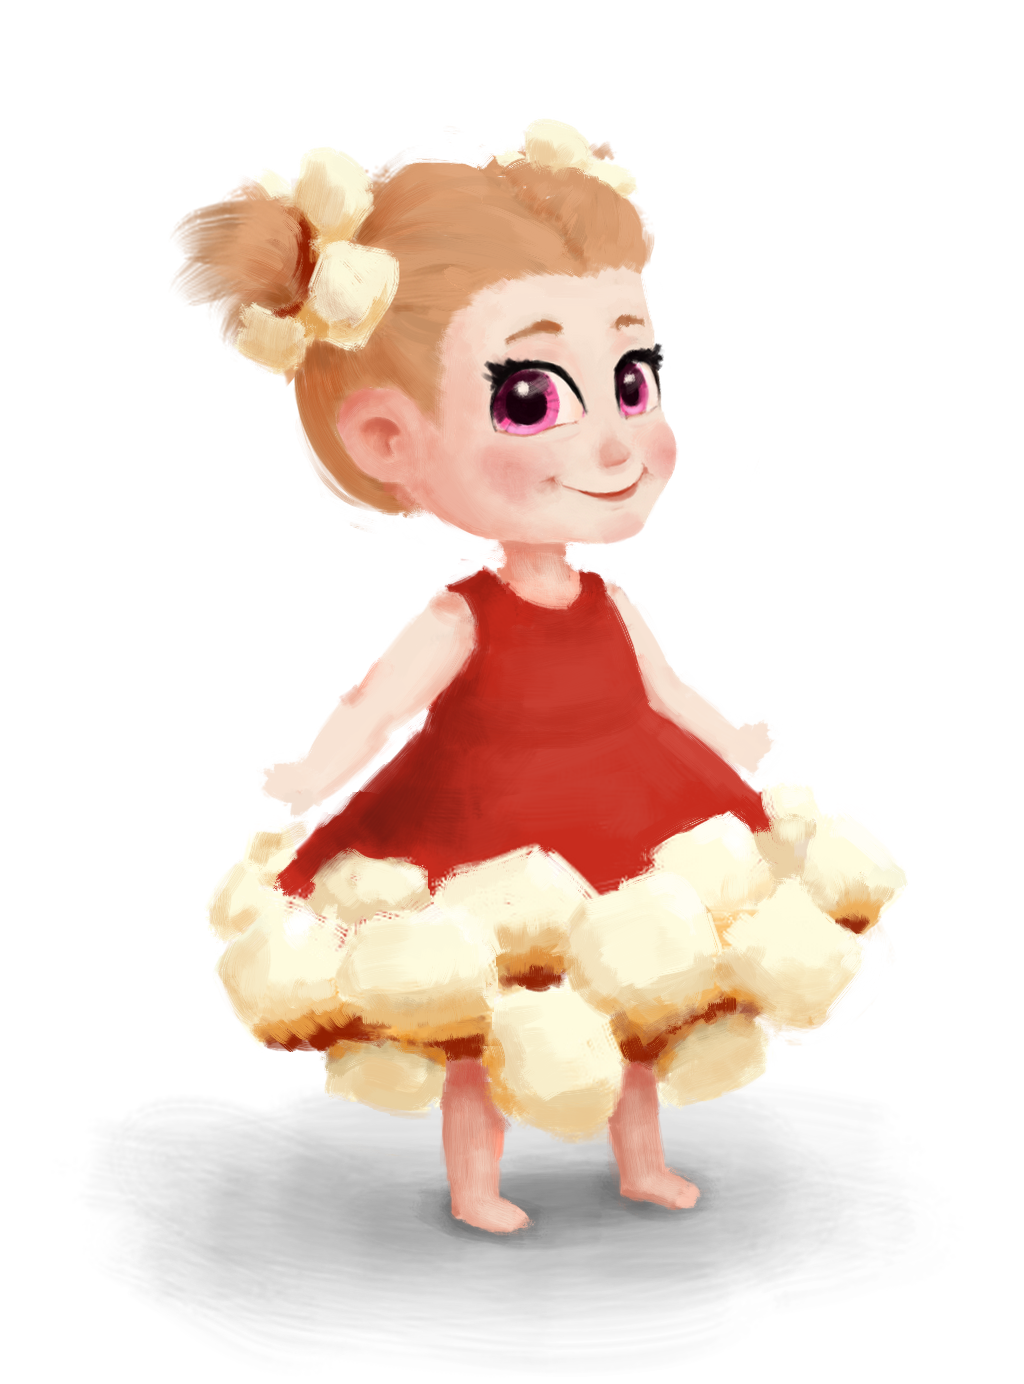 Popcorn Girl by sankaritinn